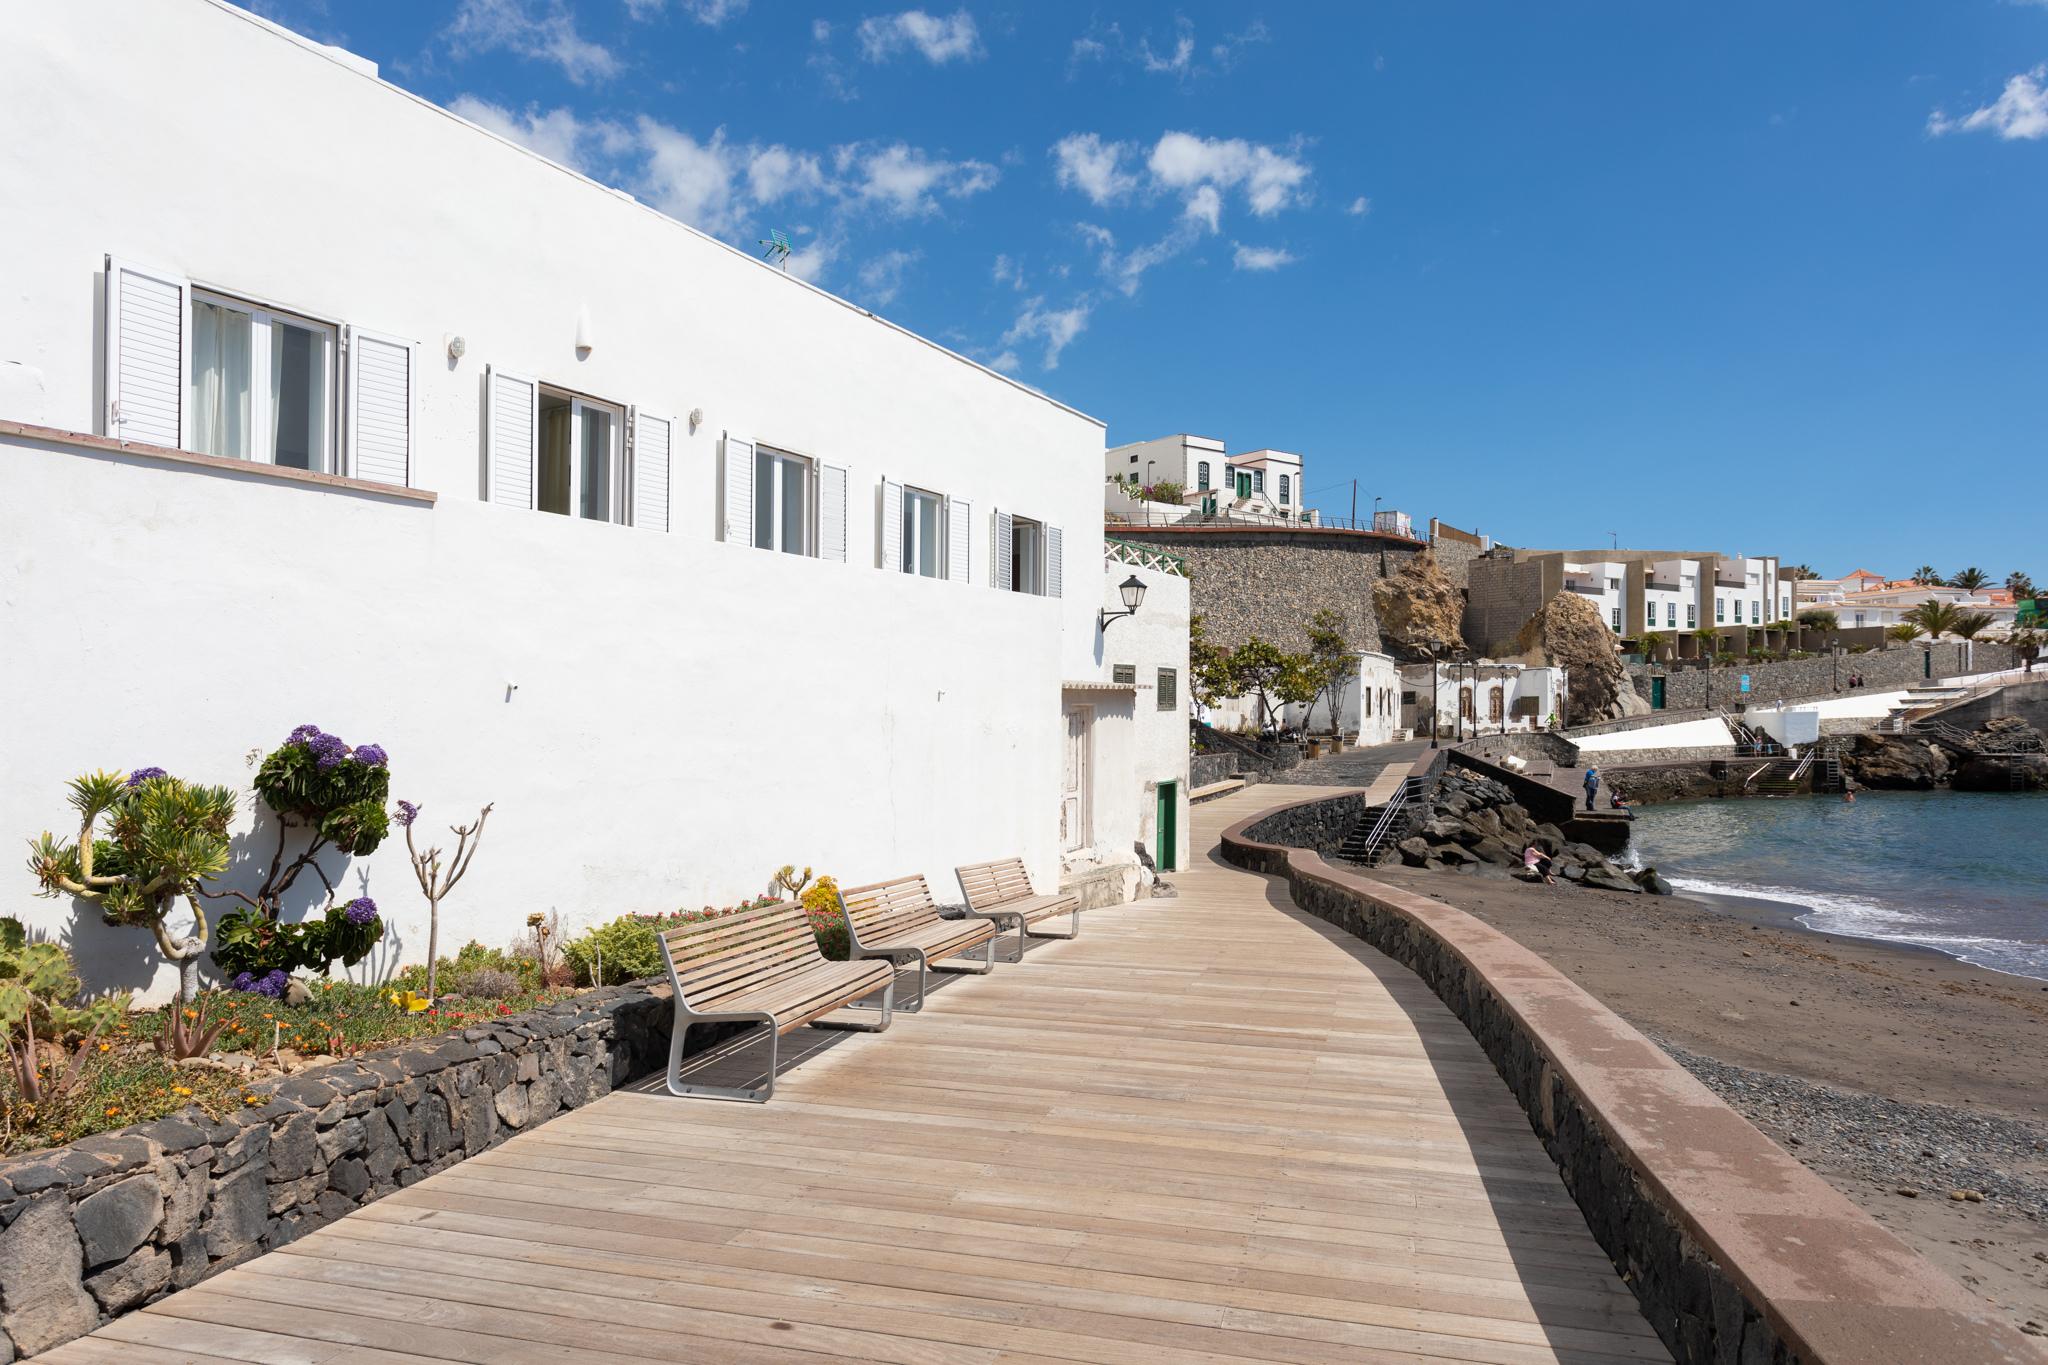 Holiday house direkt am Meer mit eigenem Pool (1671160), Poris de Abona, Tenerife, Canary Islands, Spain, picture 48